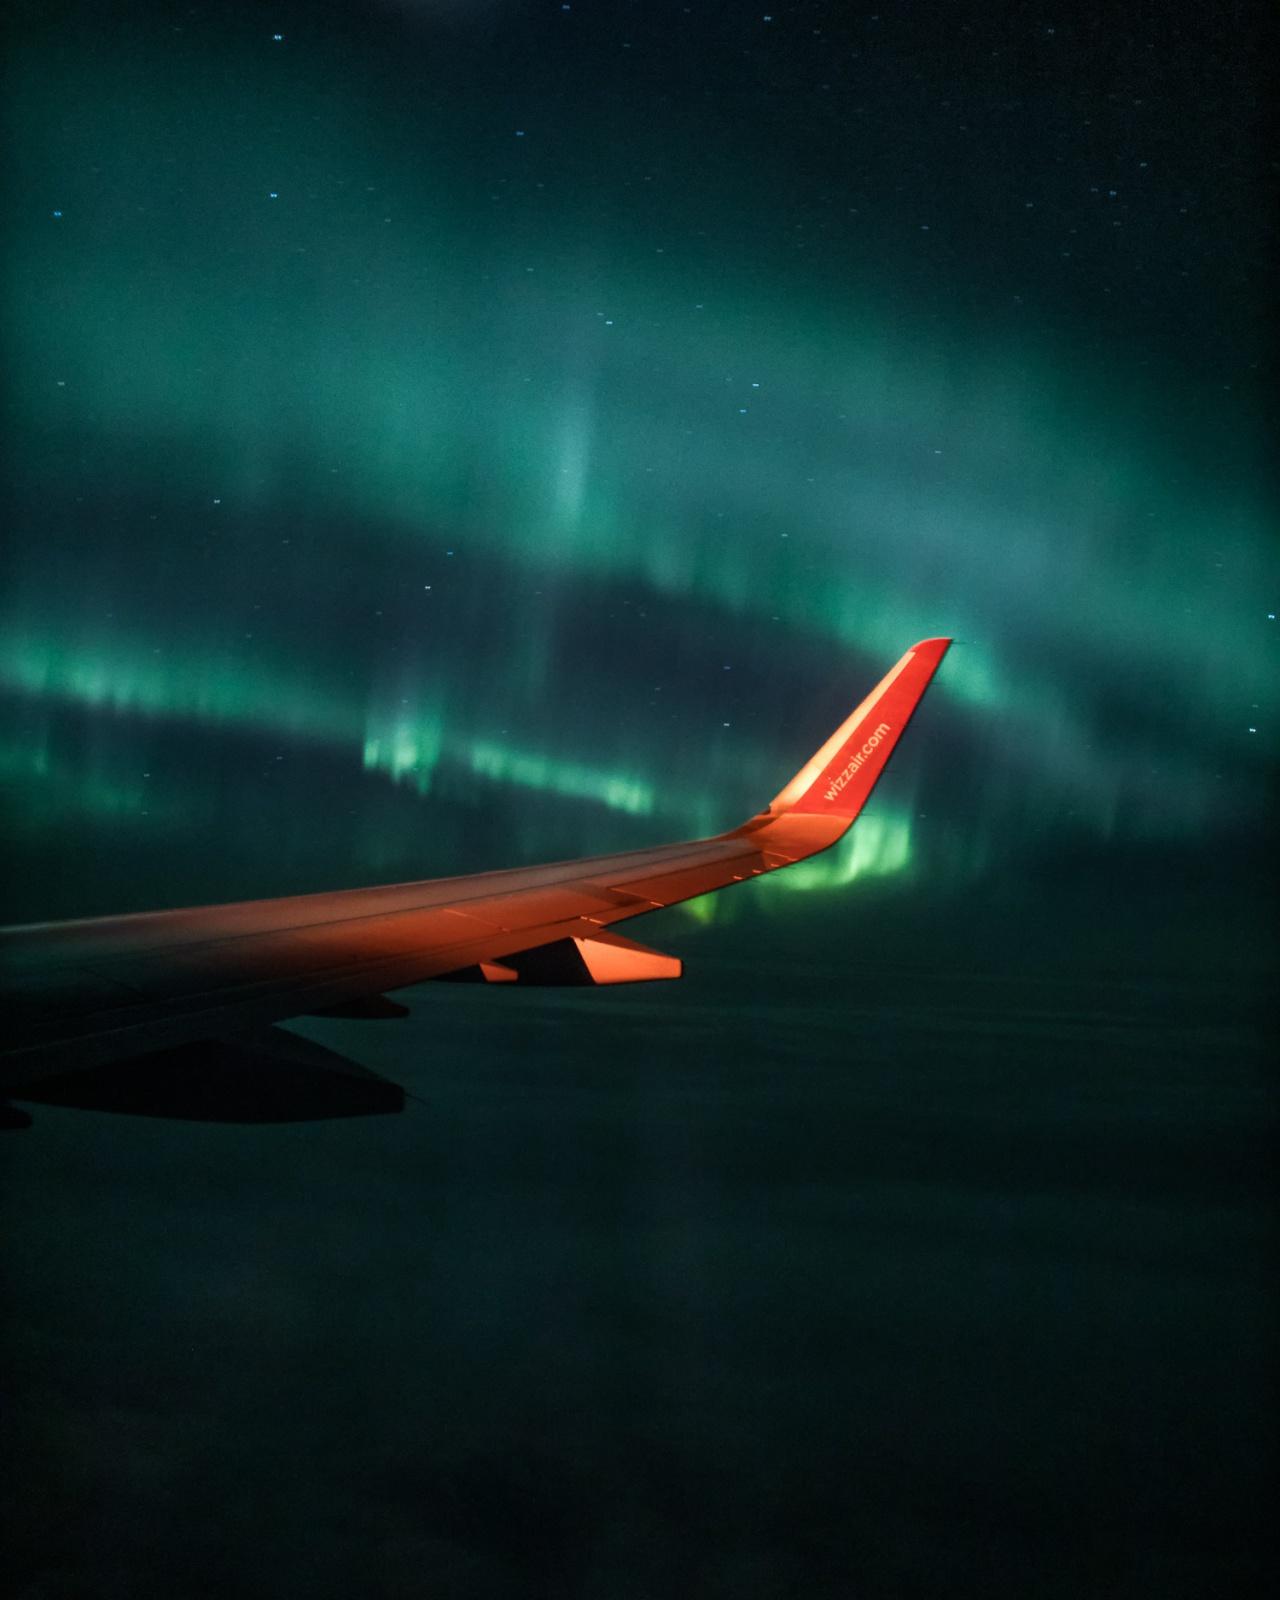 zorza samolot.jpg